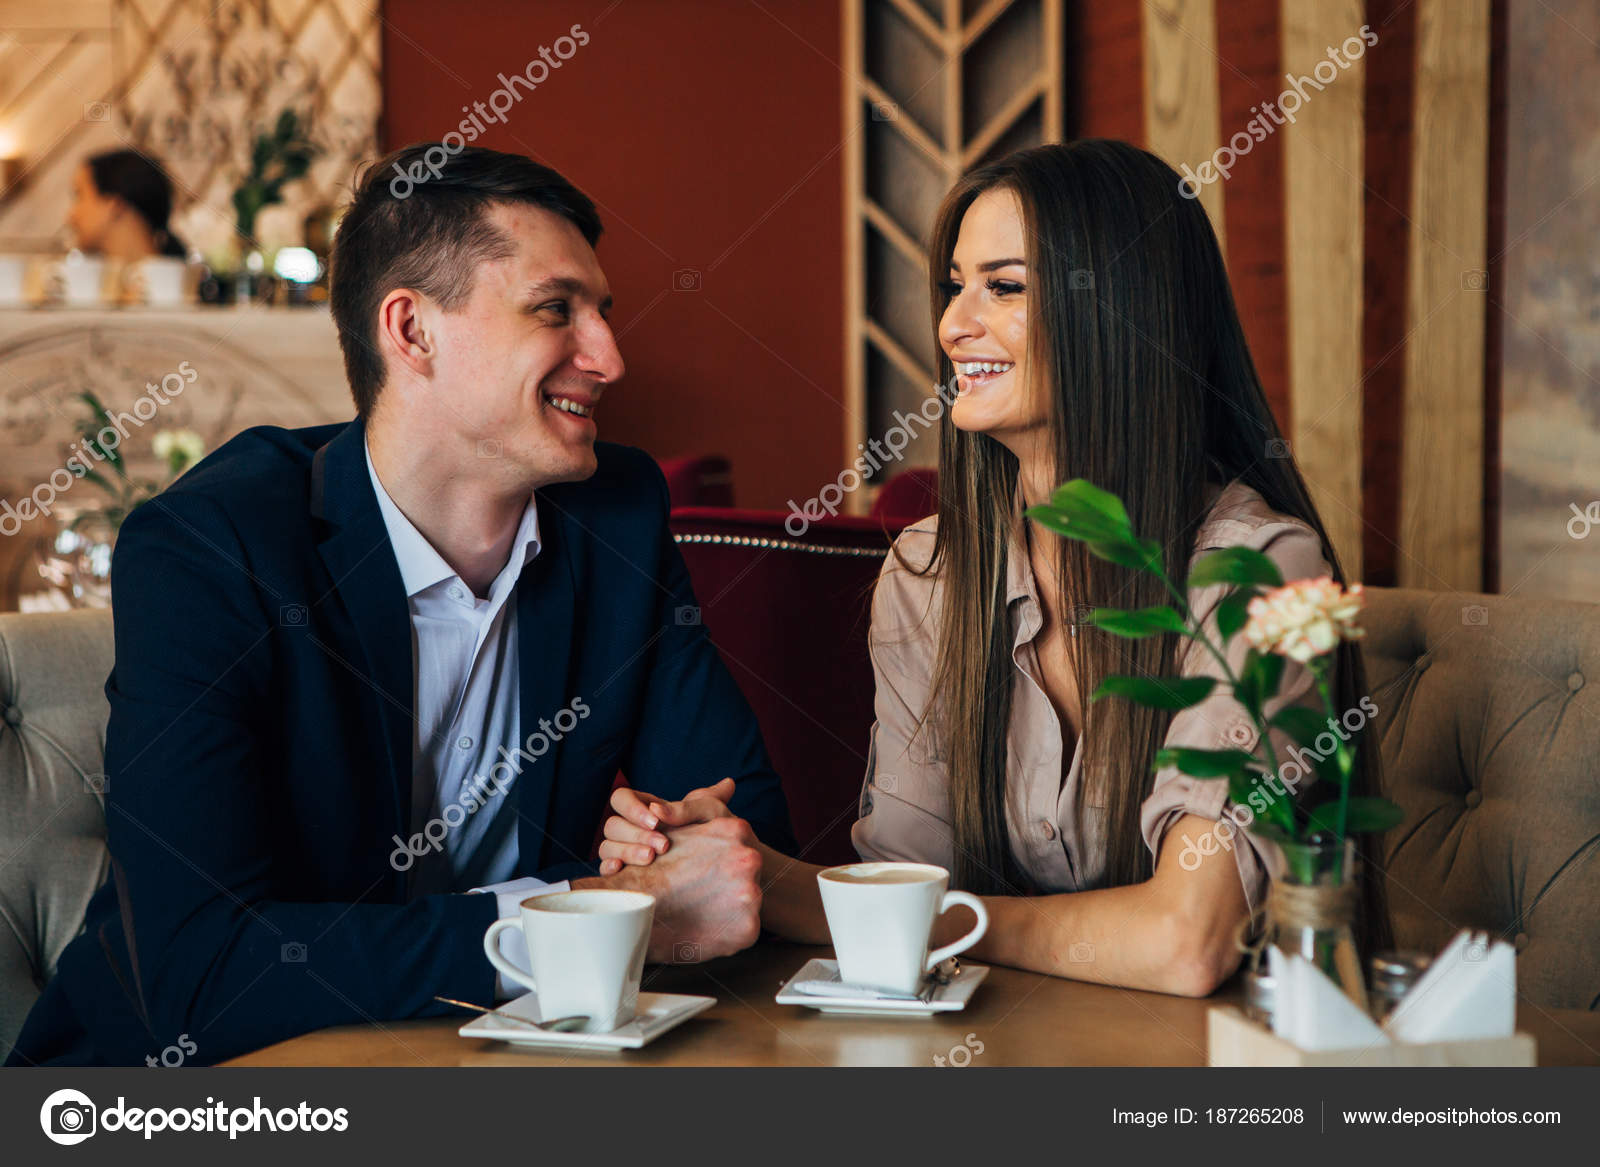 Best αμερικανικές εφαρμογές dating